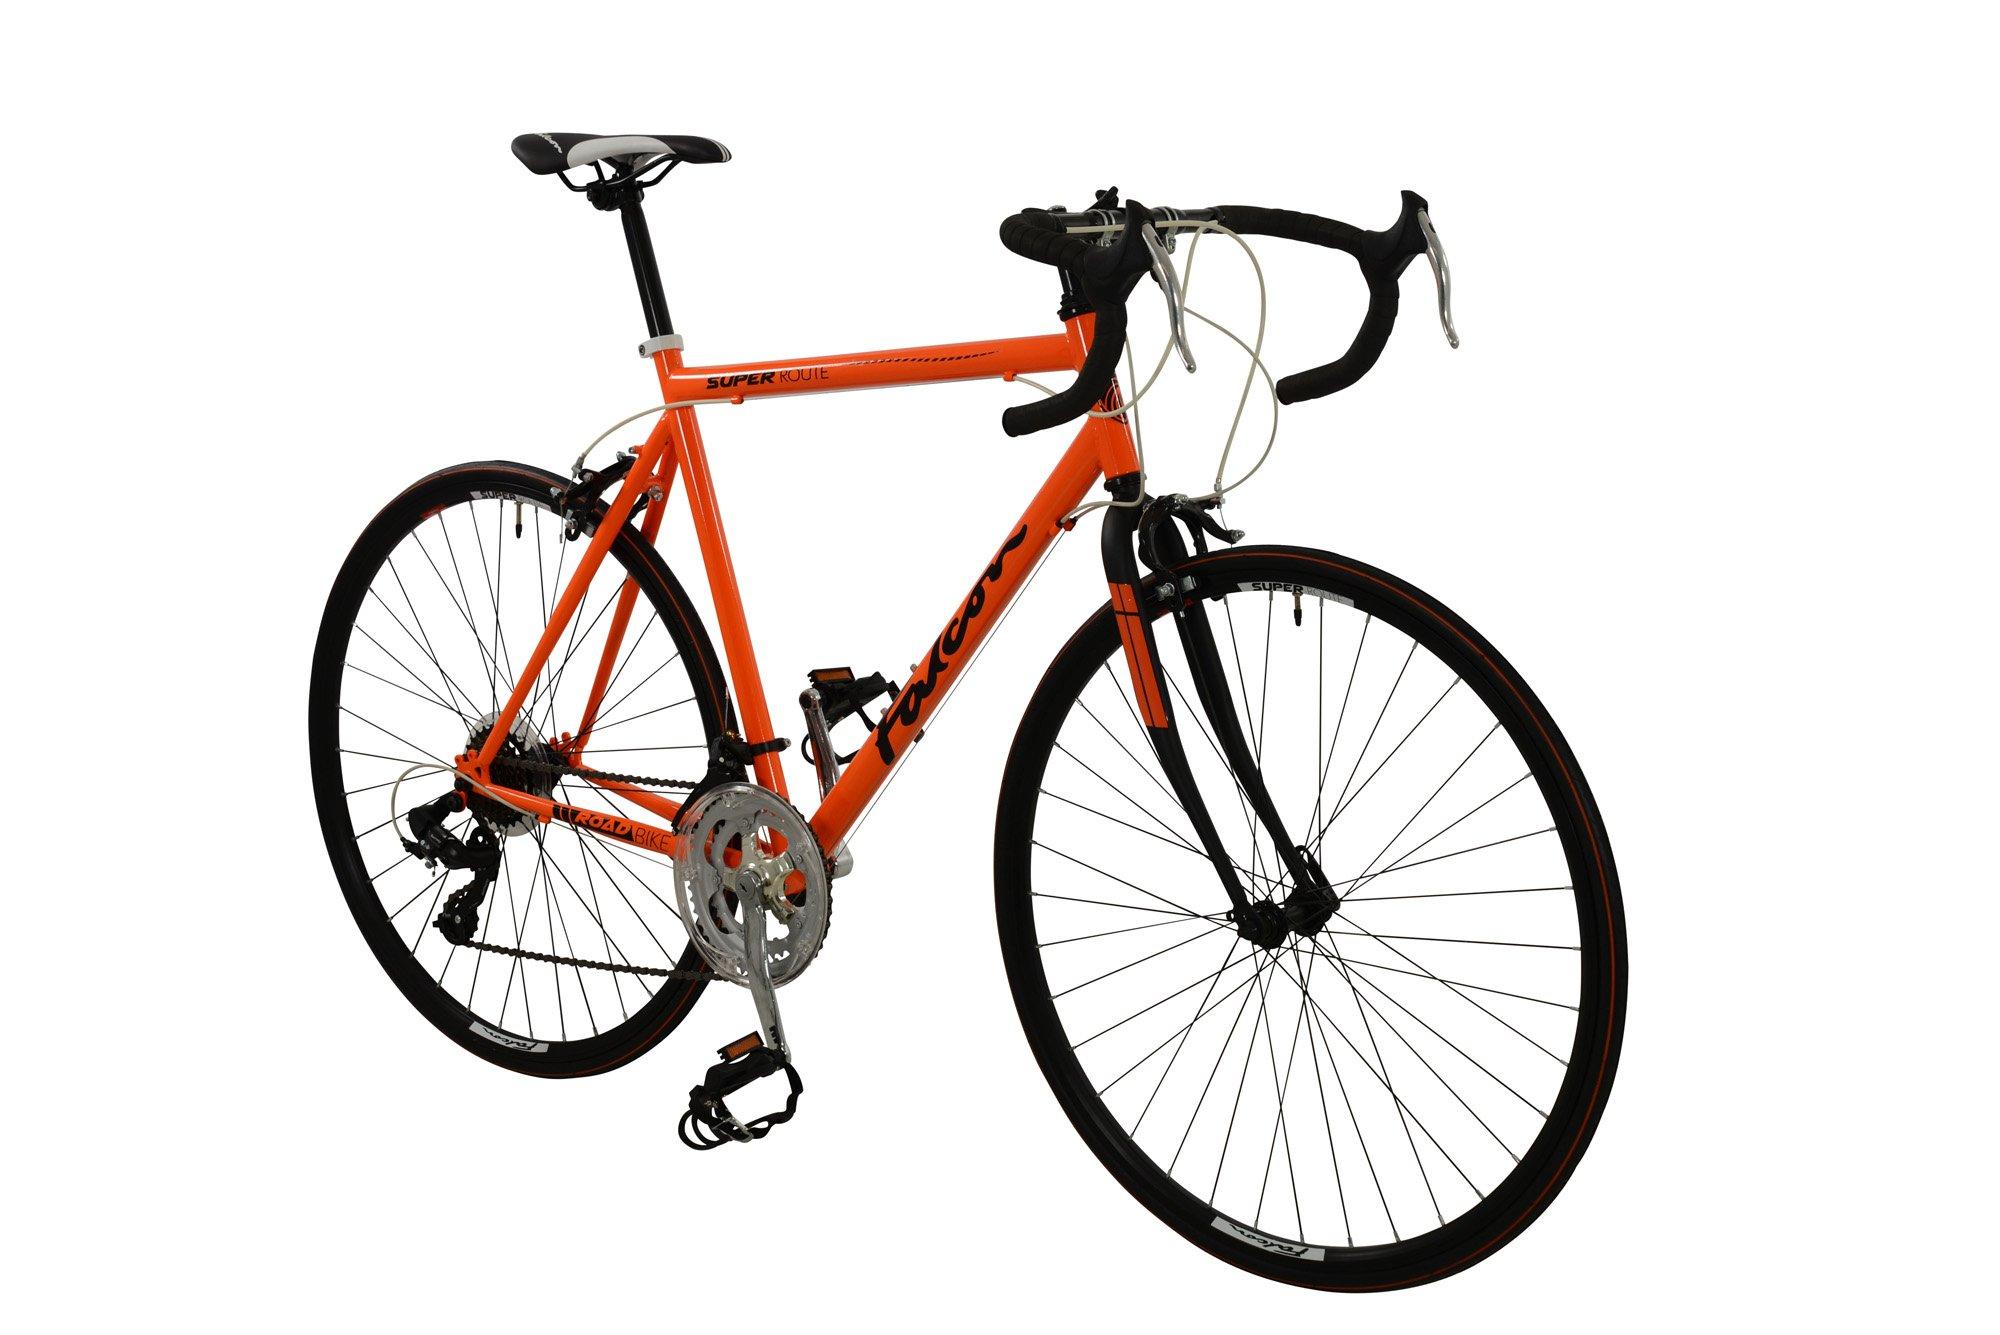 Falcon - Bicicleta de súper Ruta para Hombre, Color Rojo, Talla 12 ...